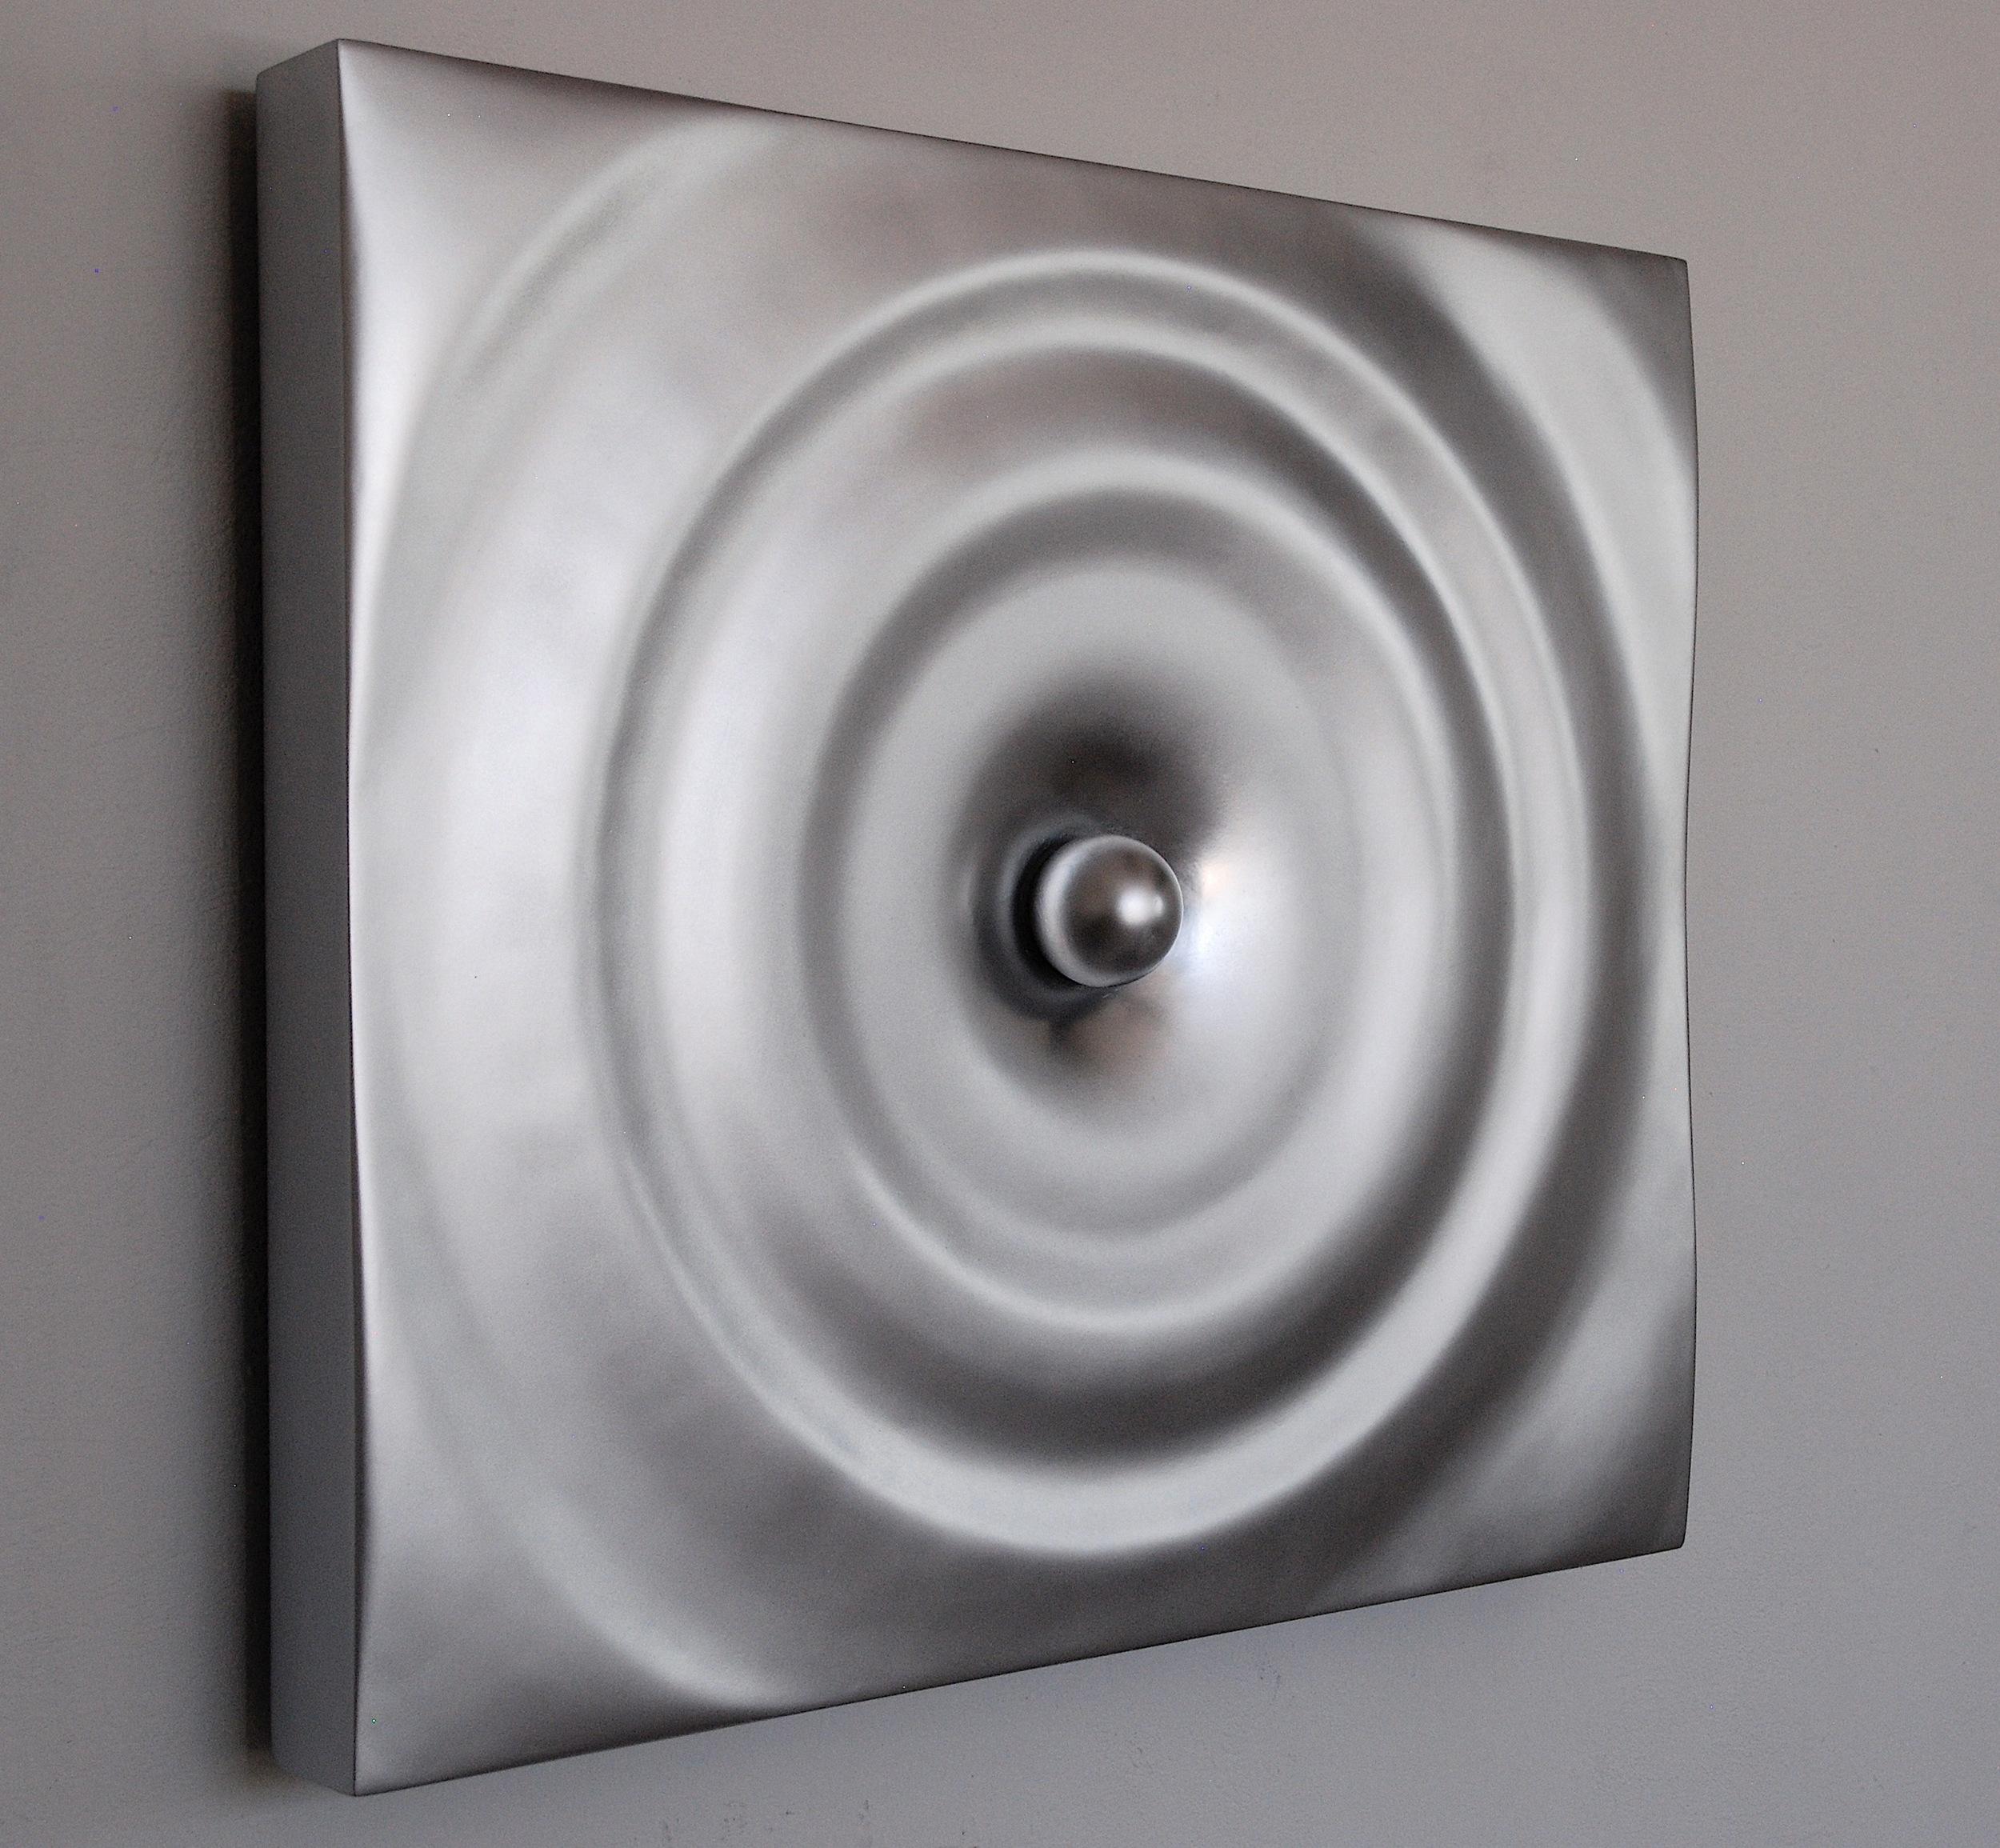 Ripple Effect (aluminum paint) - side view